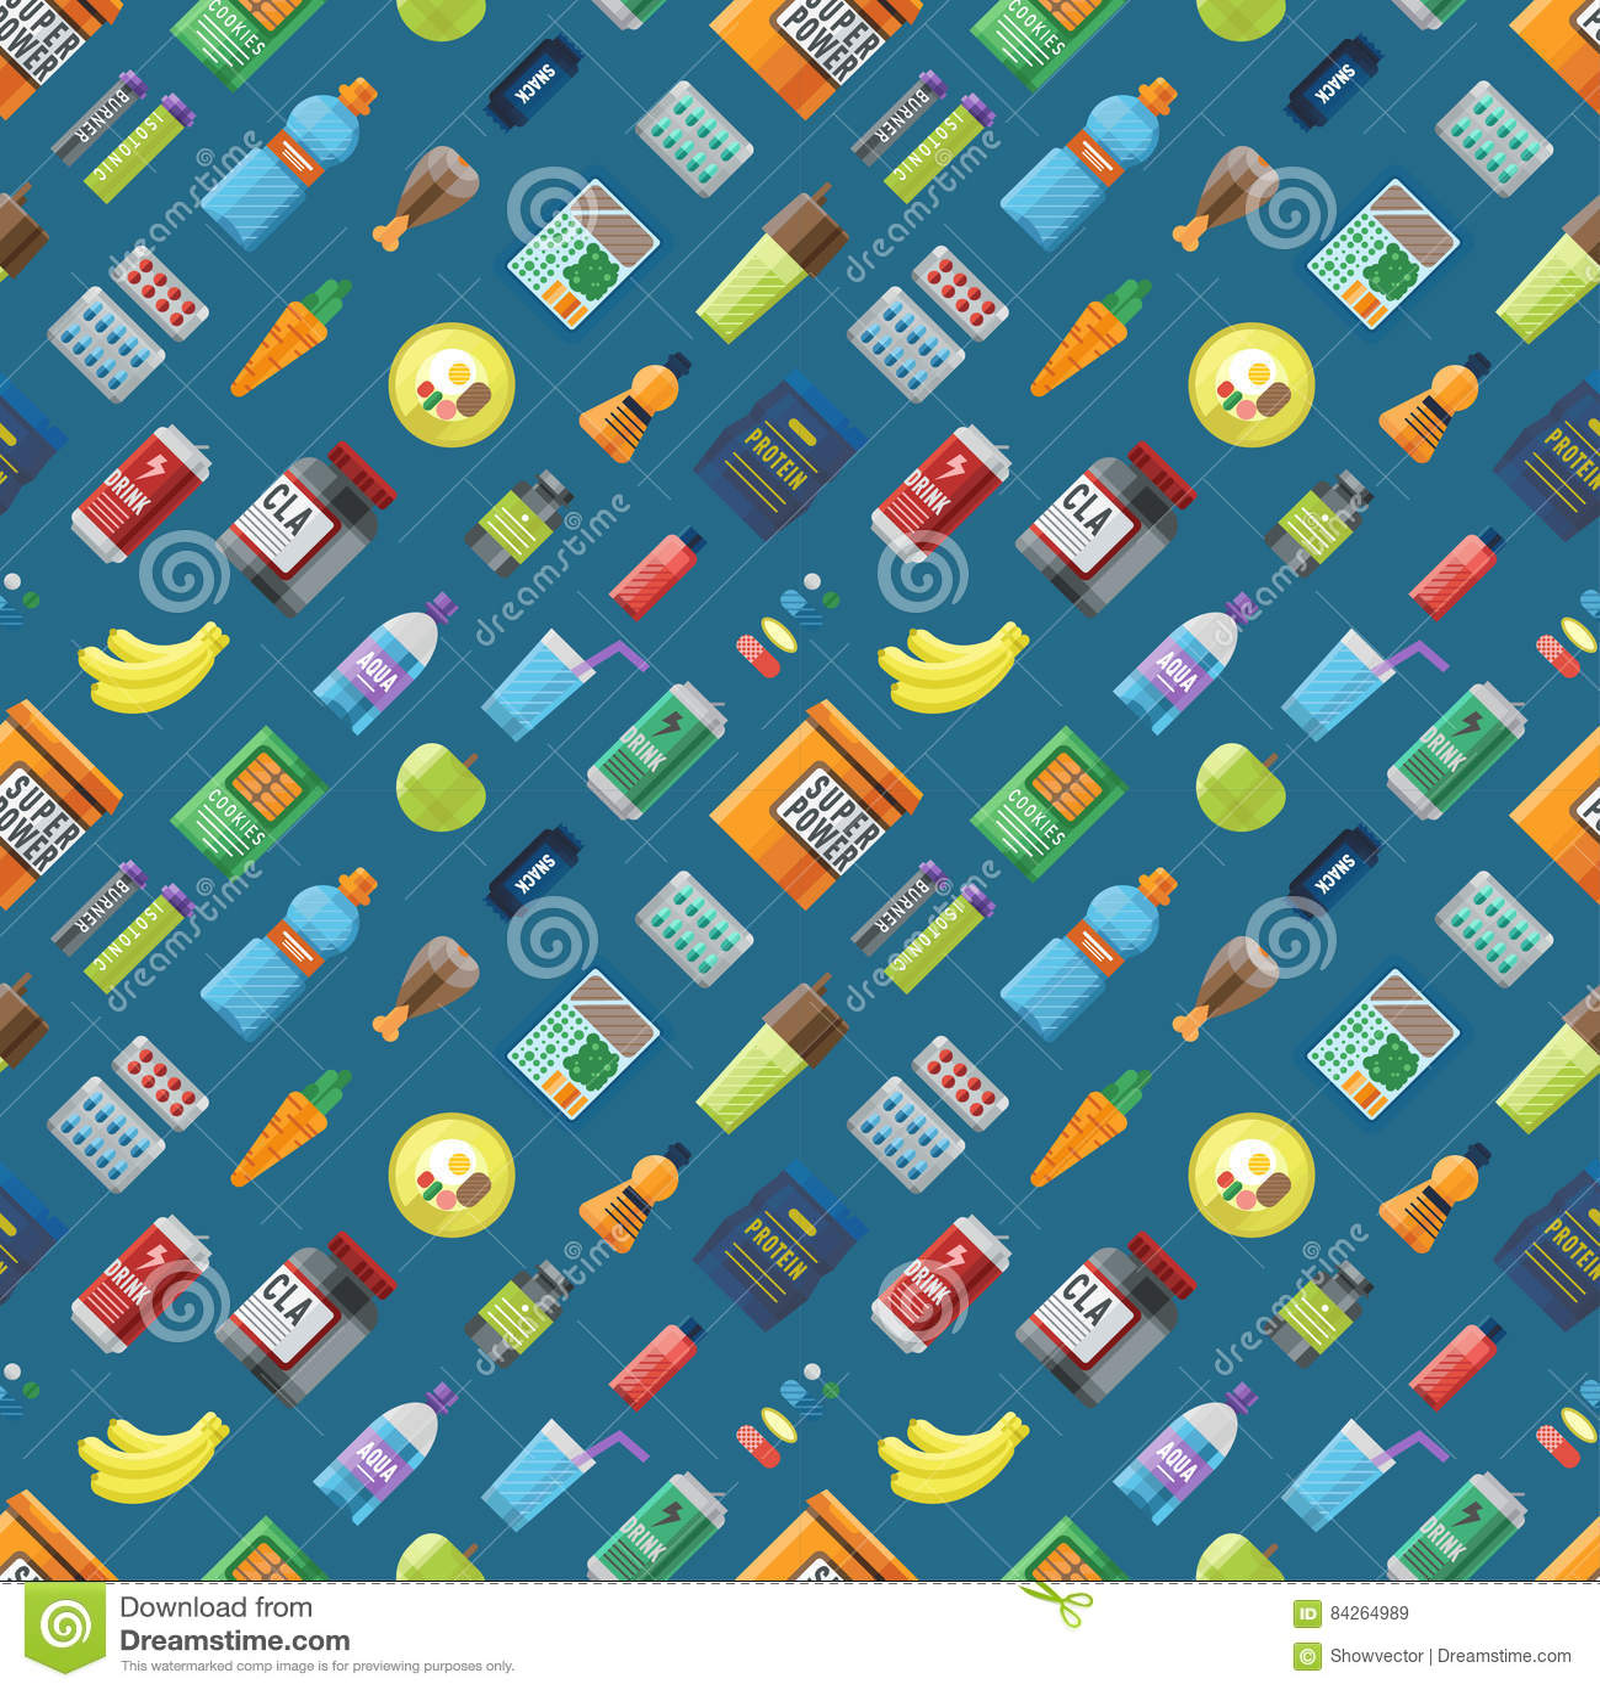 sport food seamless pattern stock vector illustration of bananasport food seamless pattern